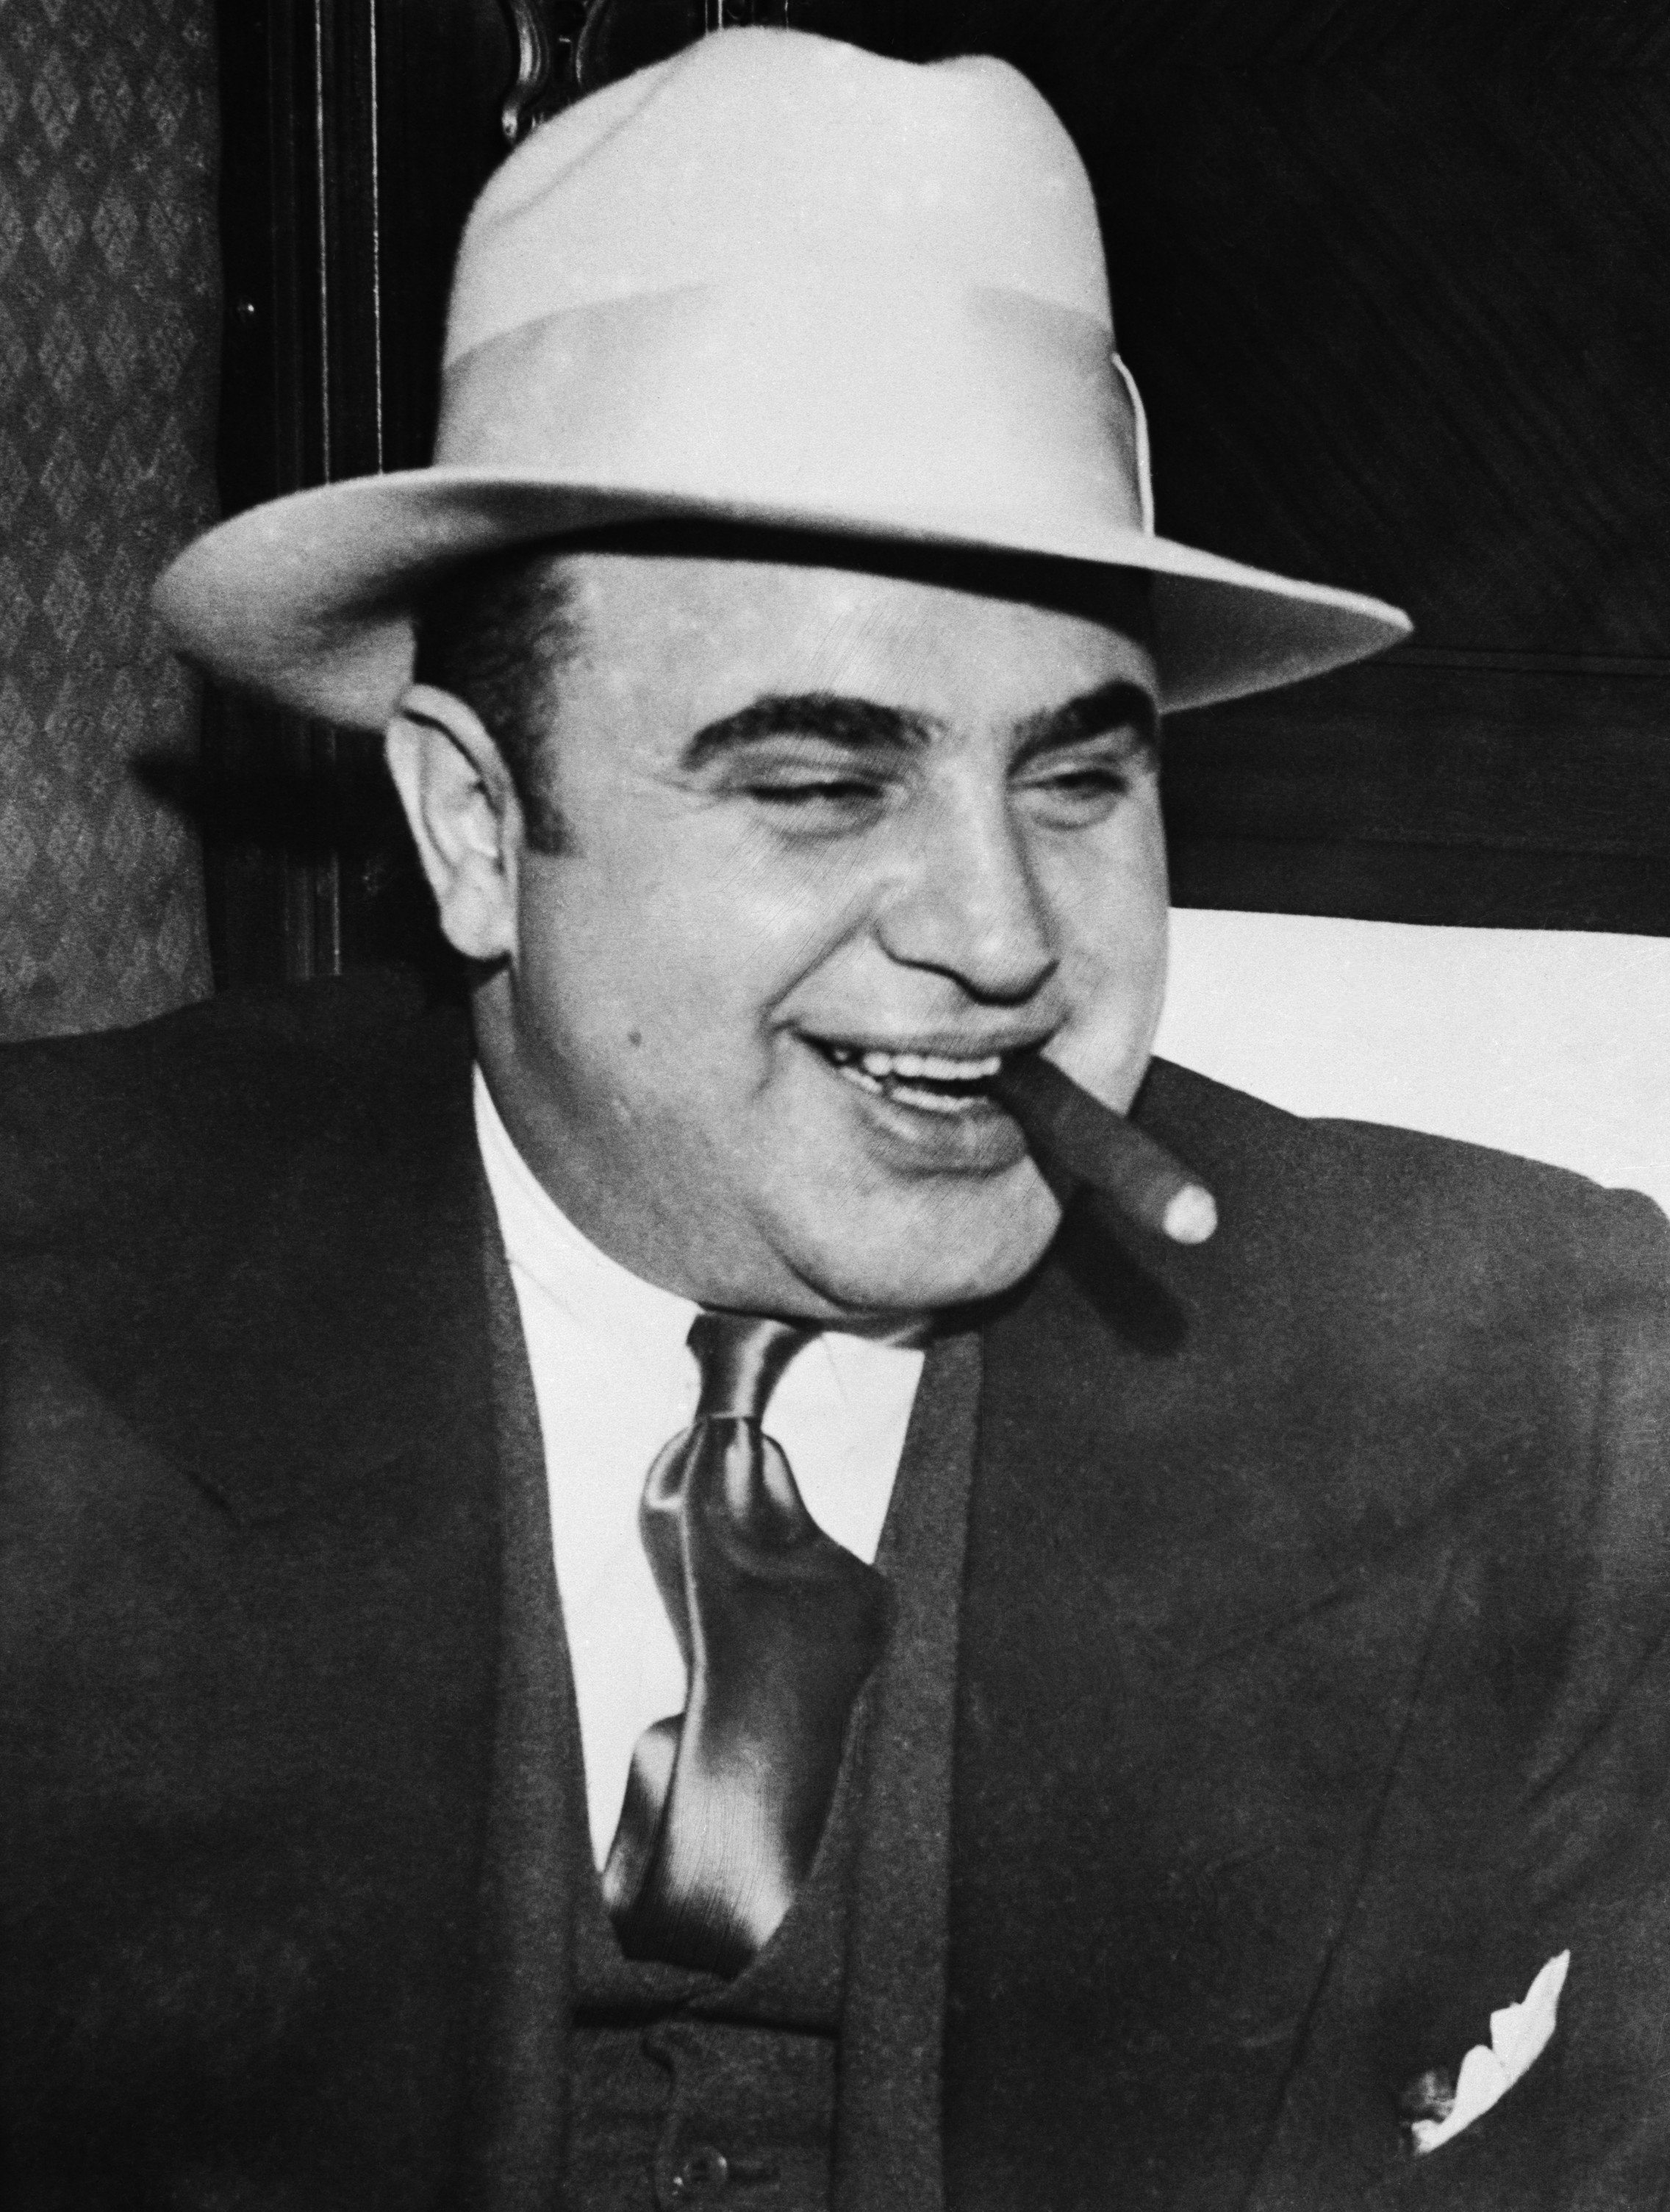 Gangster Al Capone Smoking Cigar